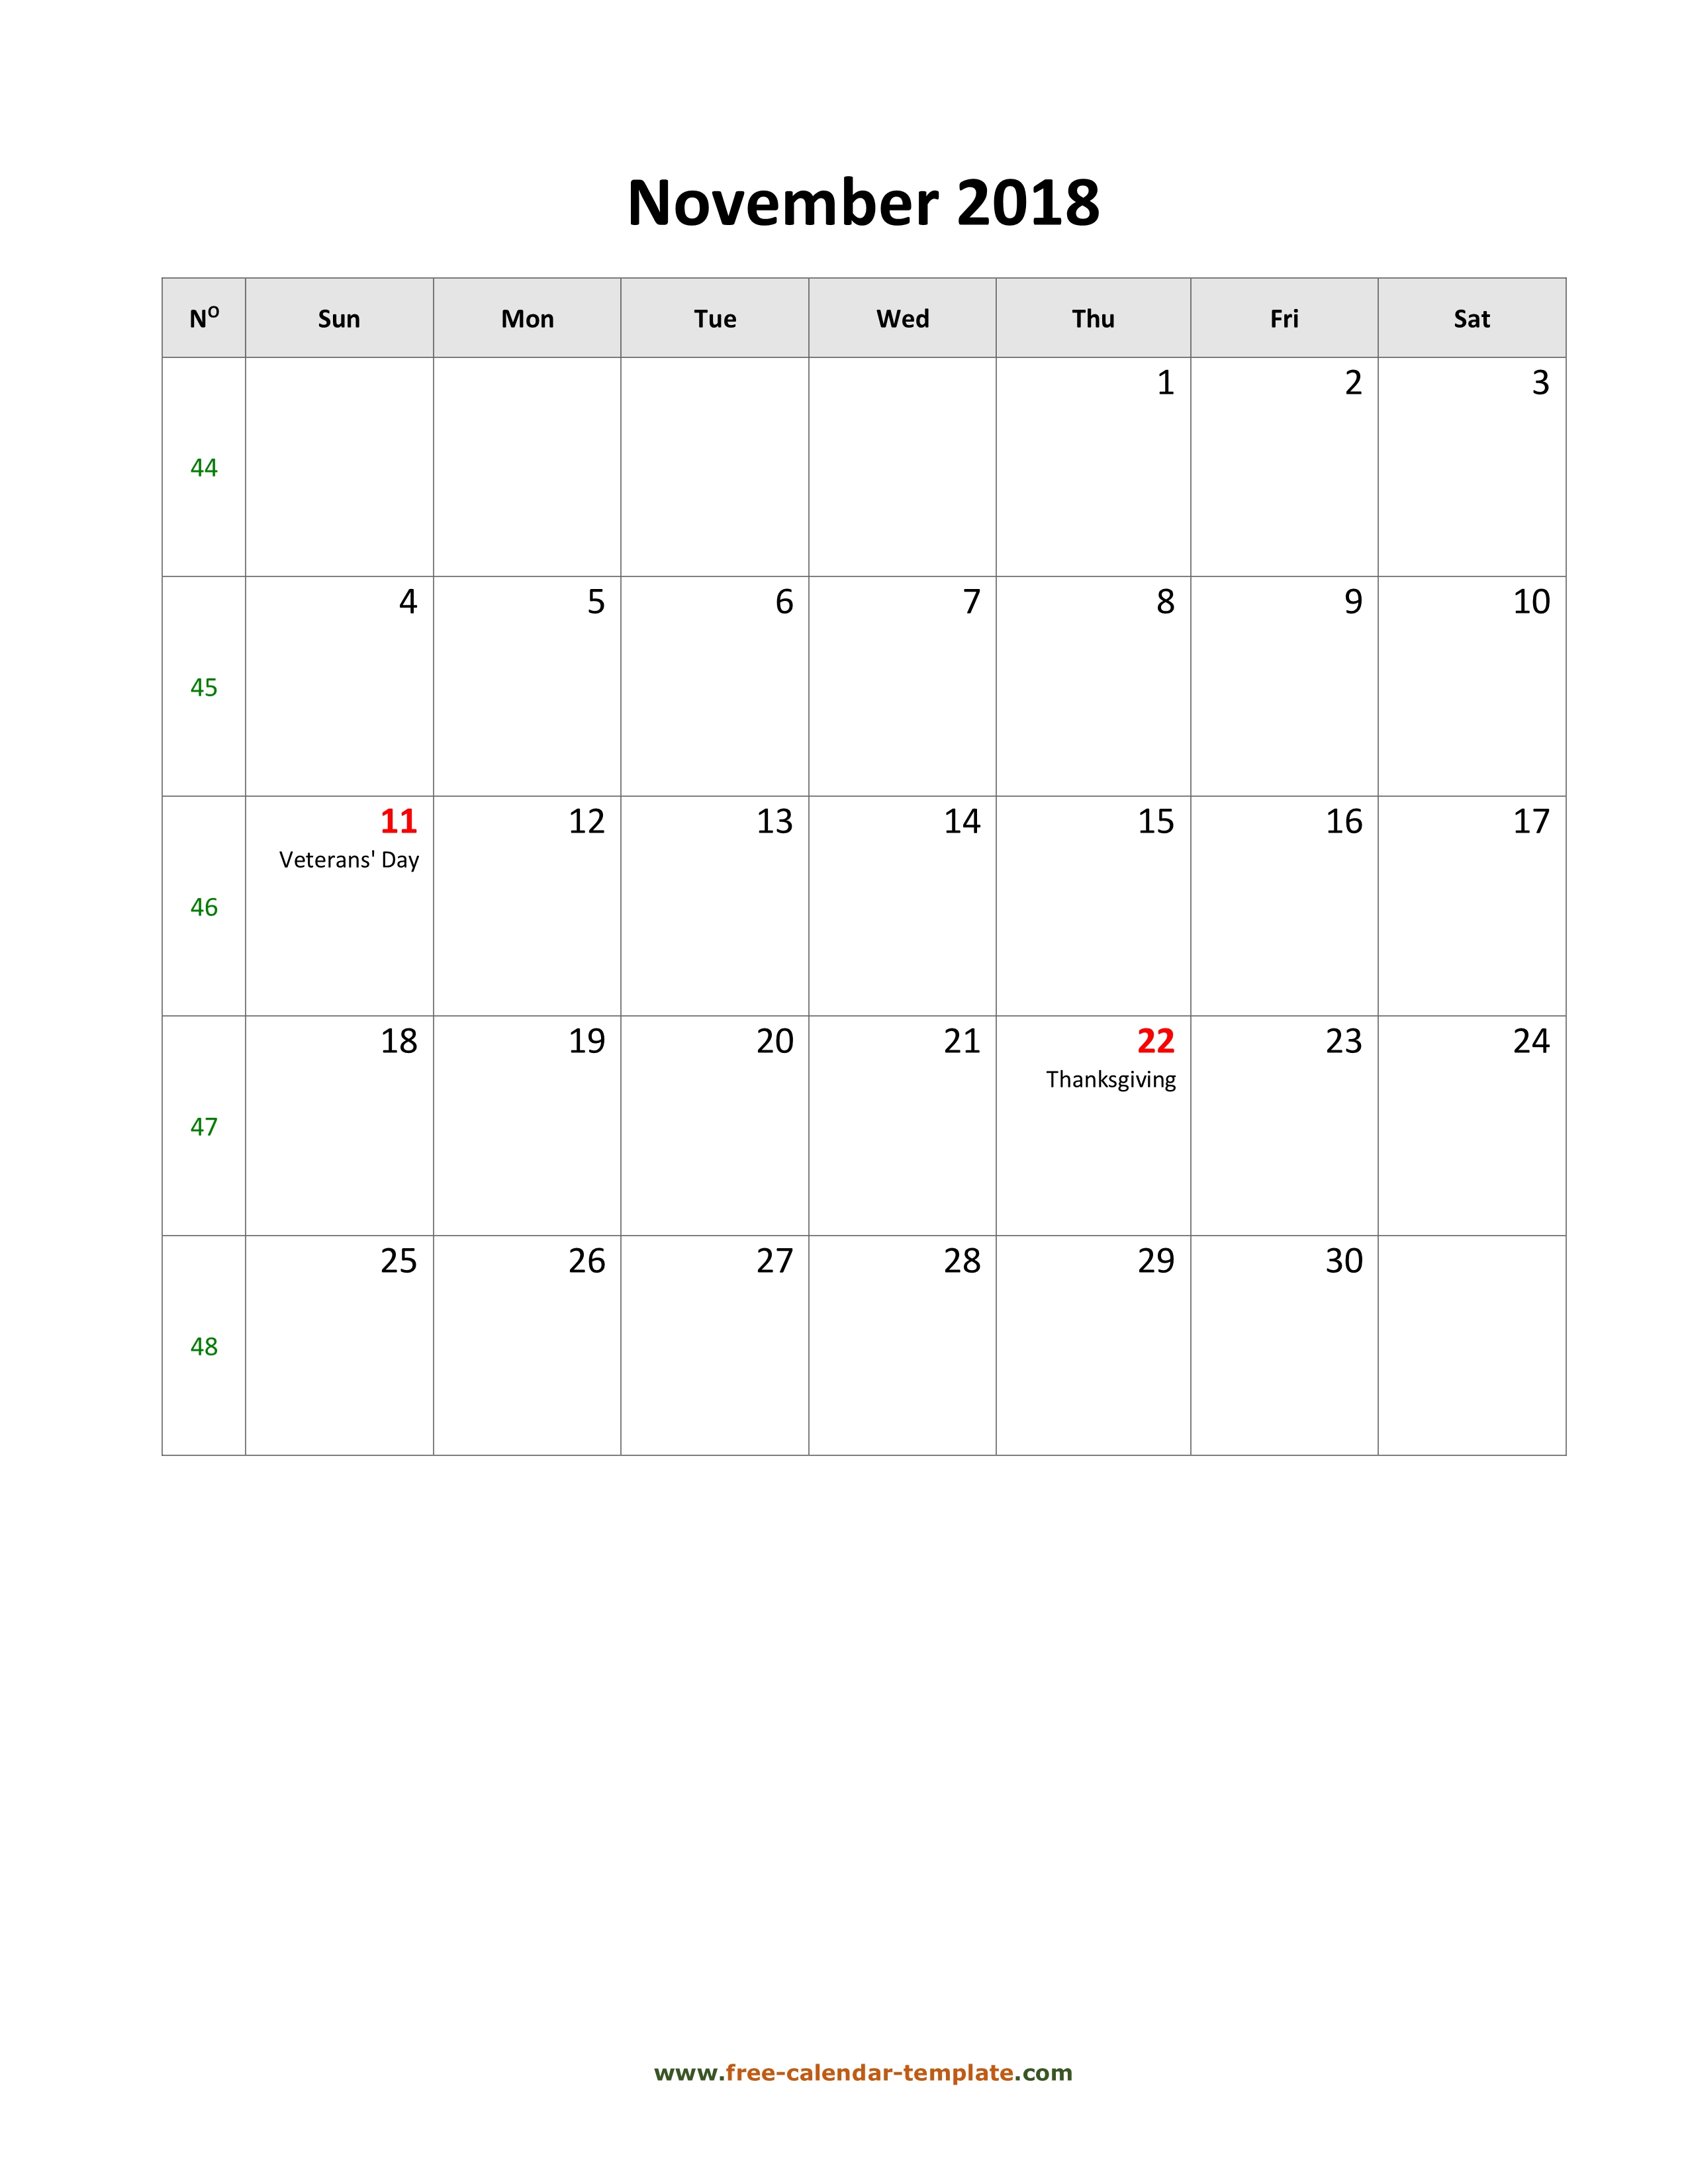 2018 November Calendar (Blank Vertical Template)   Free-Calendar for Holidays Calendar Templates November